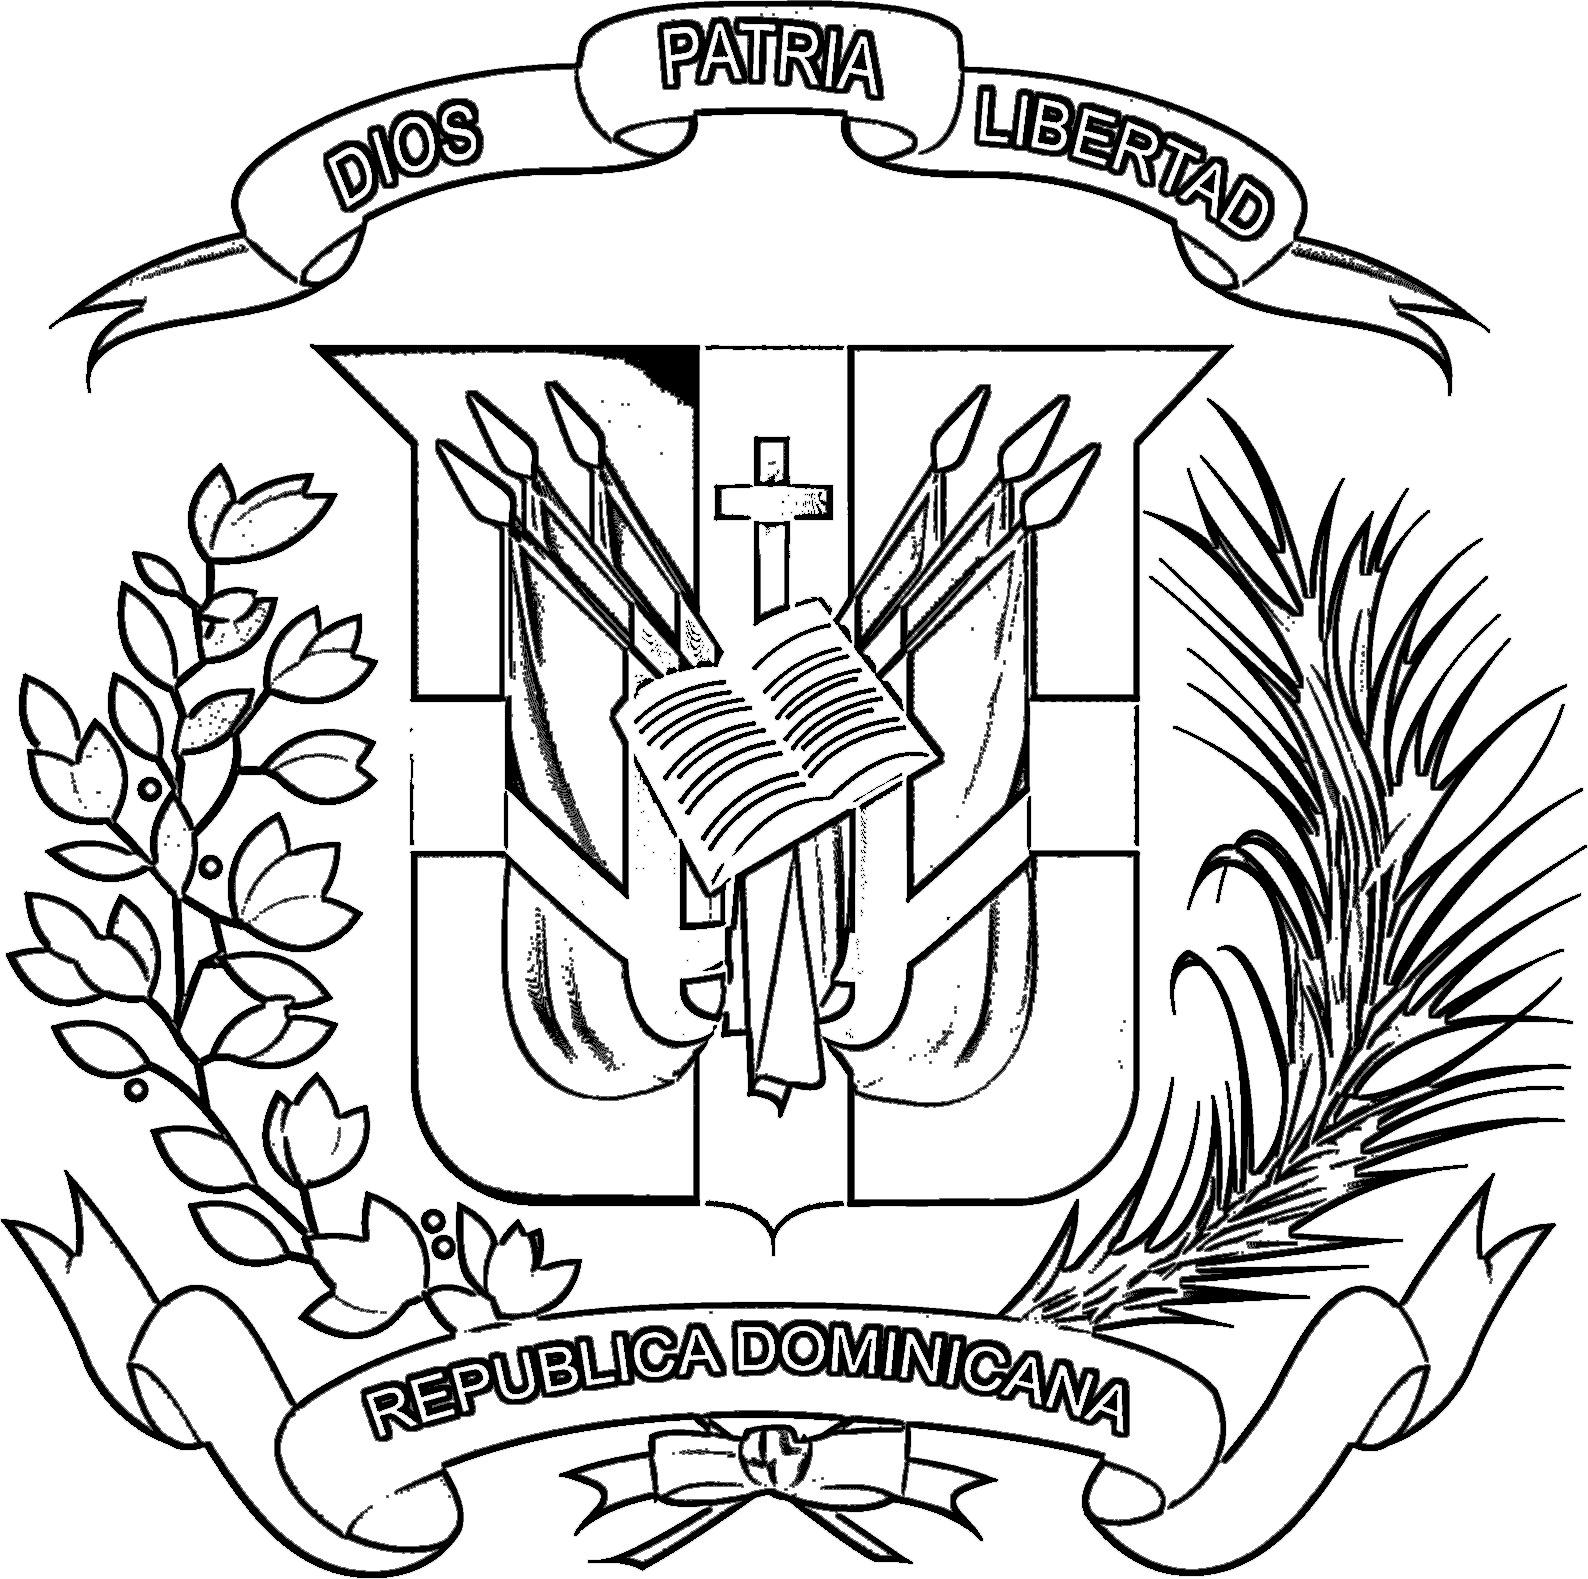 1588x1579 Escudo De Republica Dominicana Para Imprimir